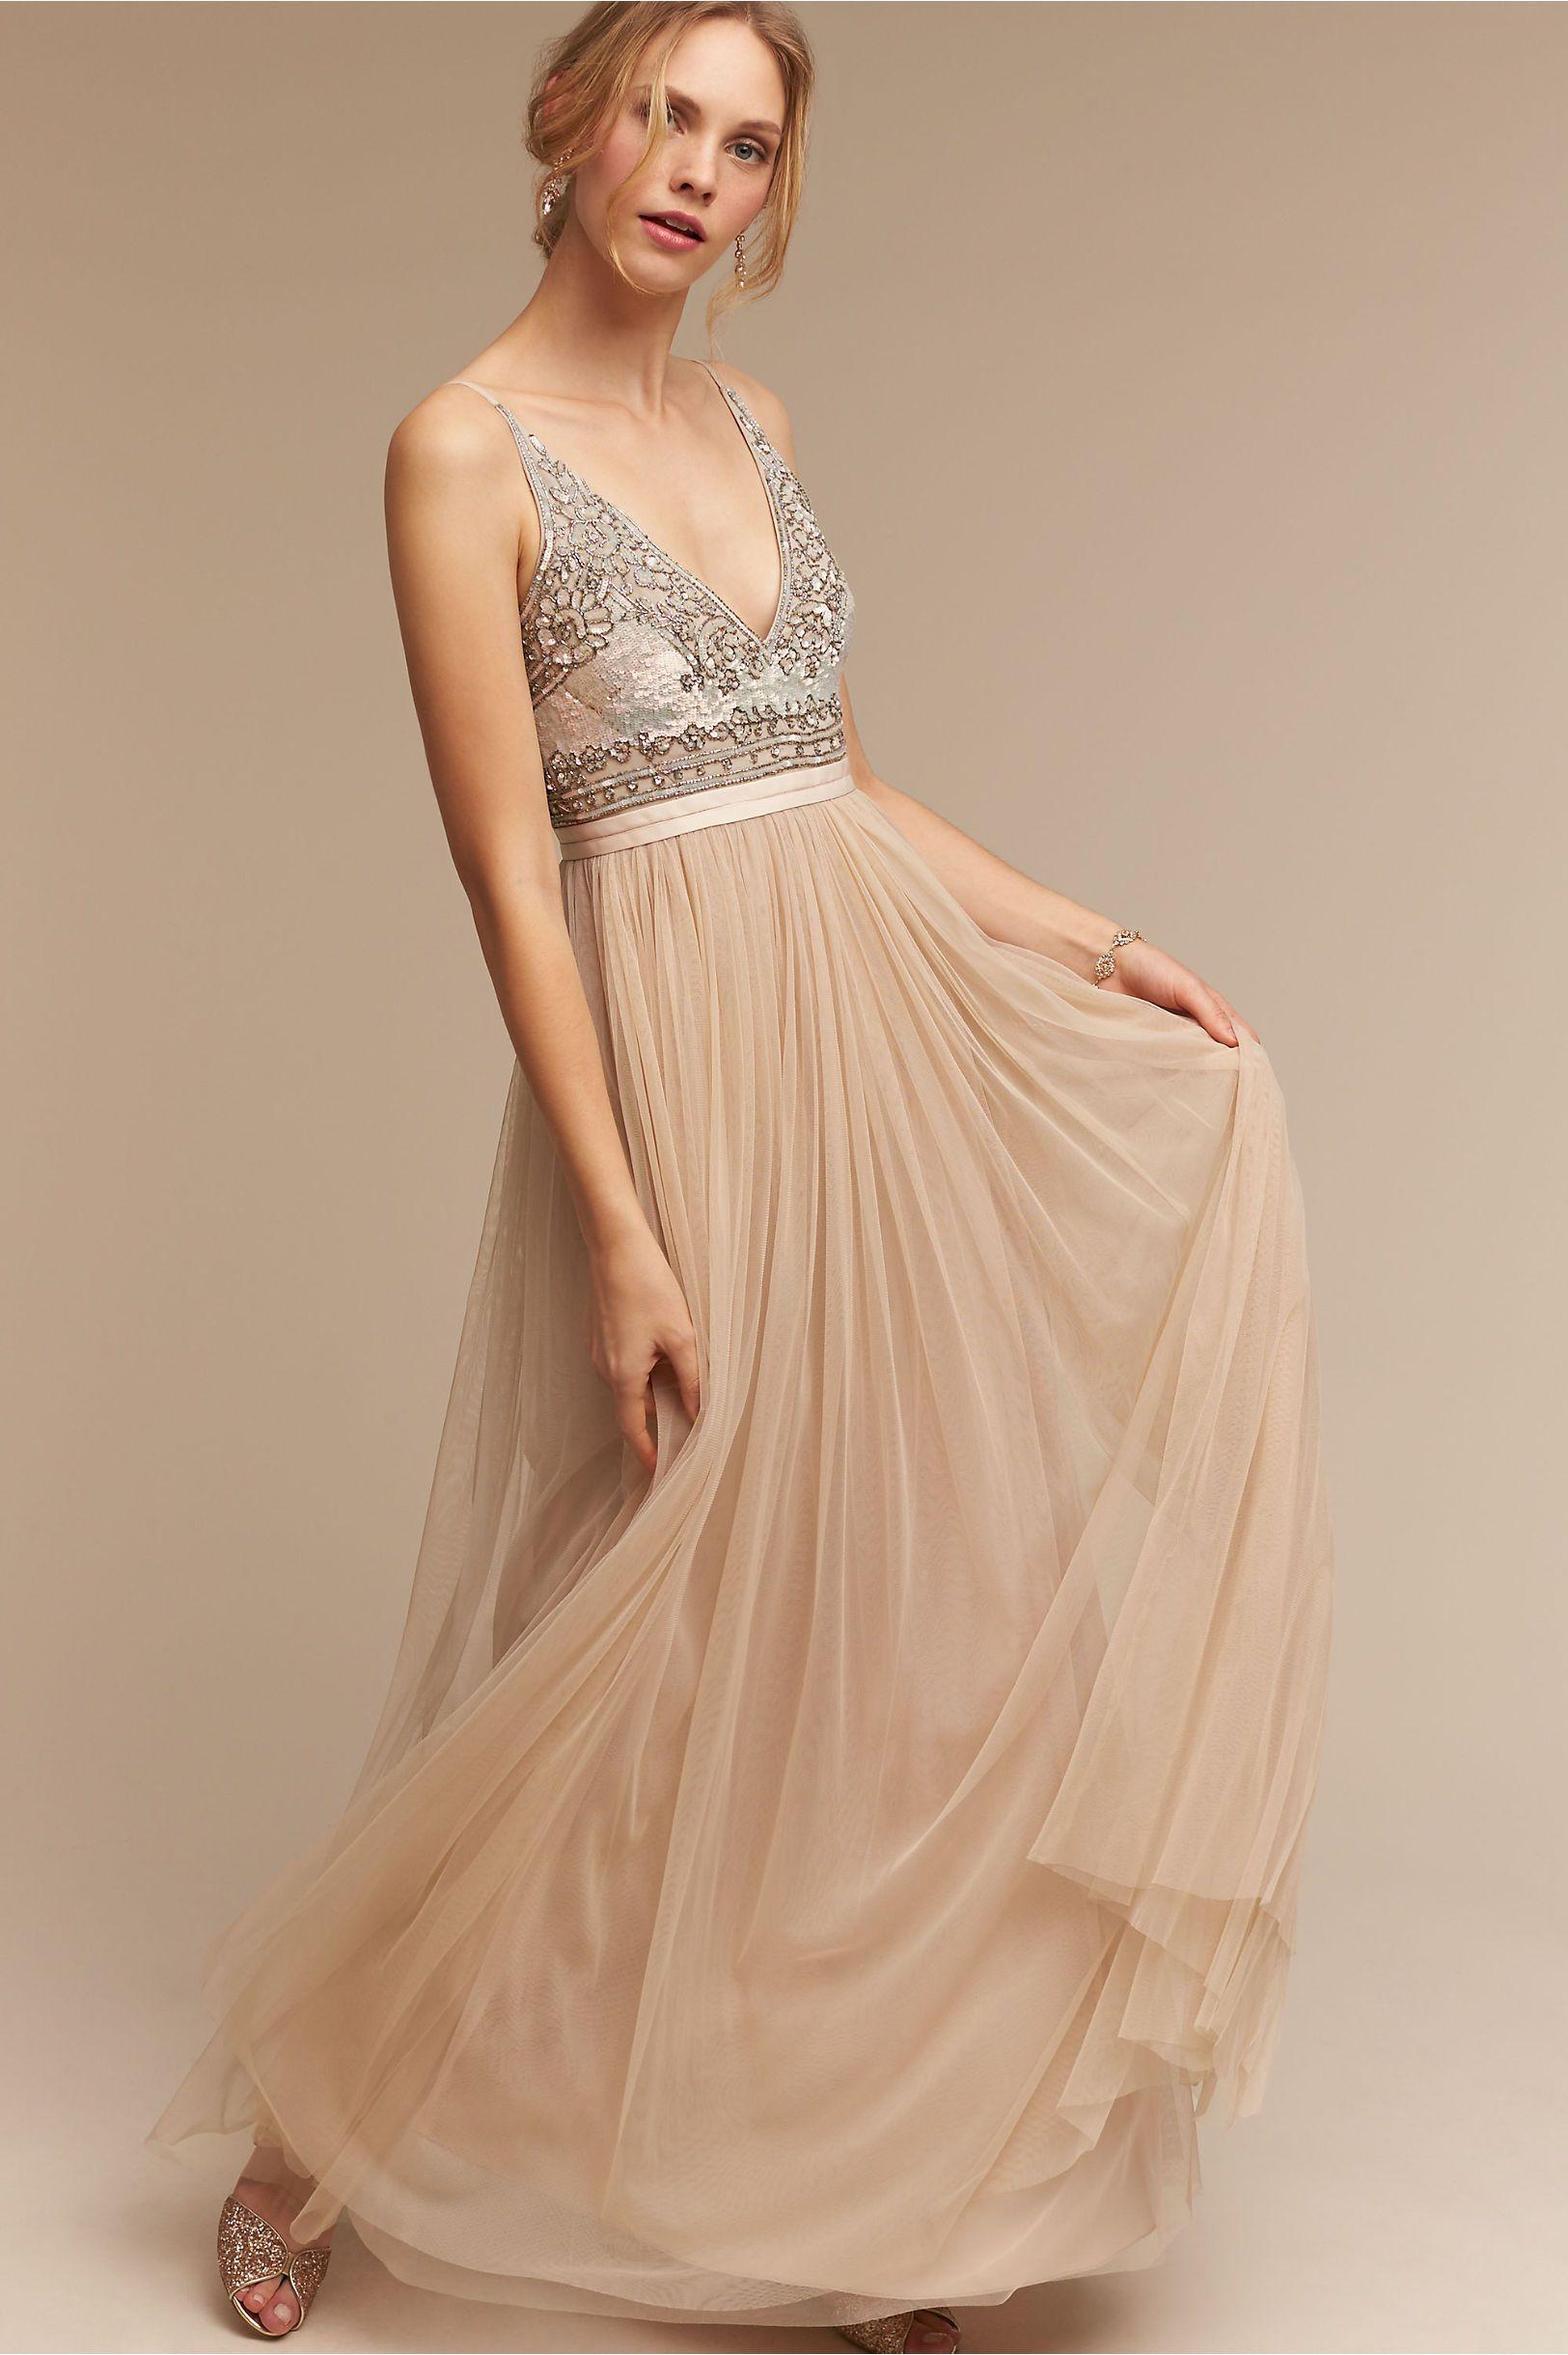 BHLDN Brisa Dress in Bride Bridal Style Bohemian at BHLDN   vestidos ...